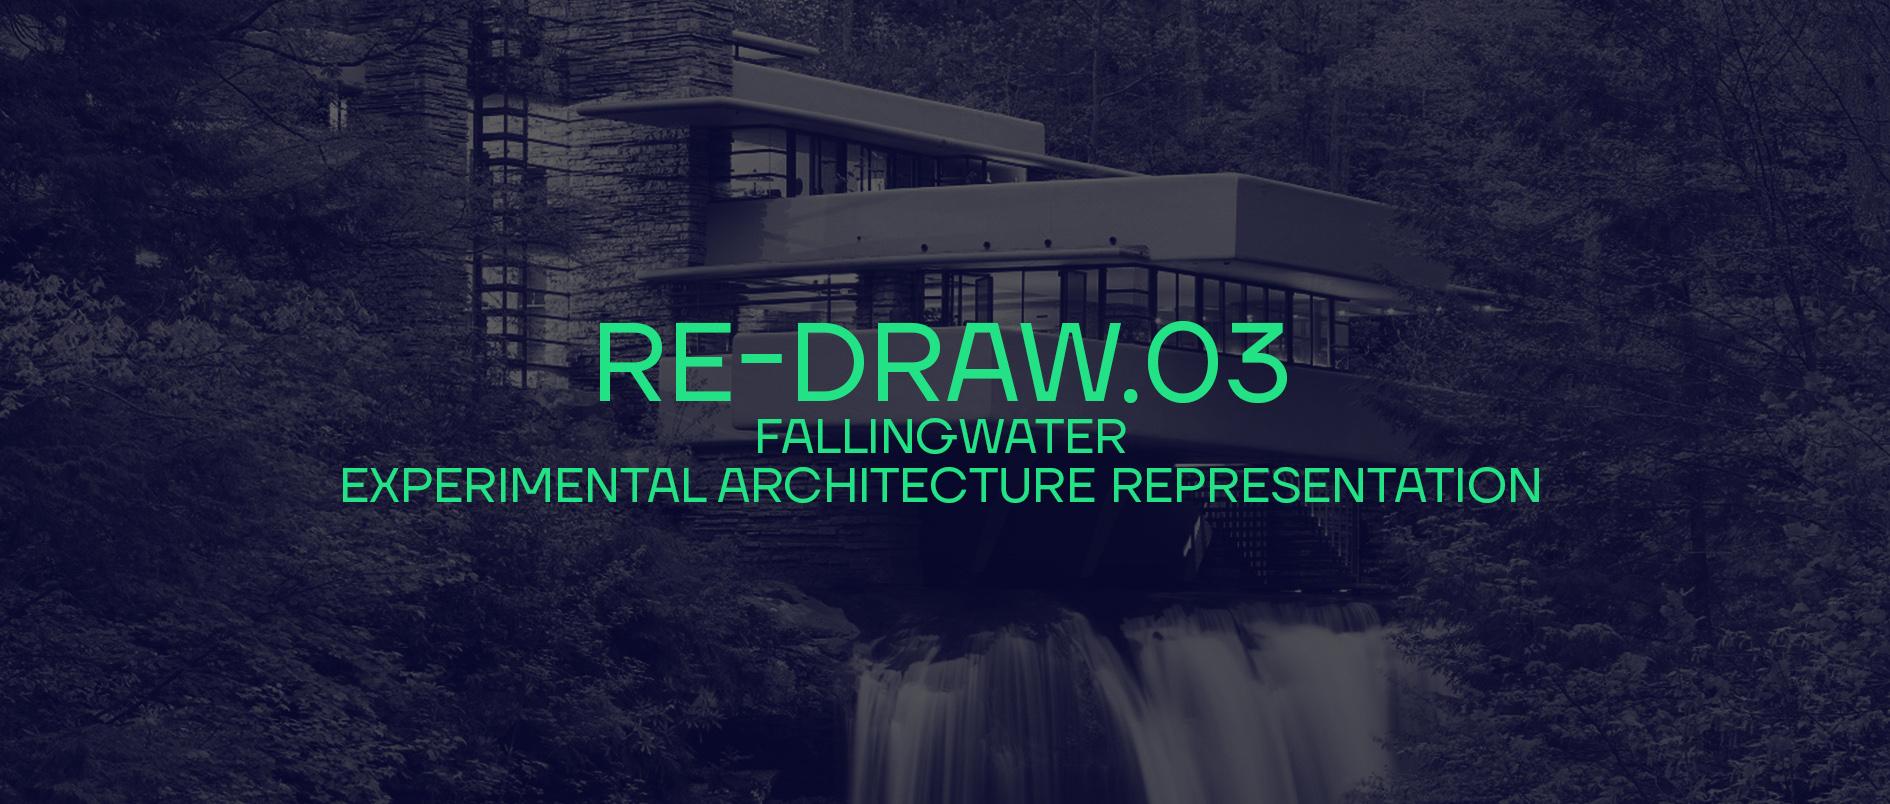 RE-DRAW.03——重绘流水别墅建筑表现竞赛